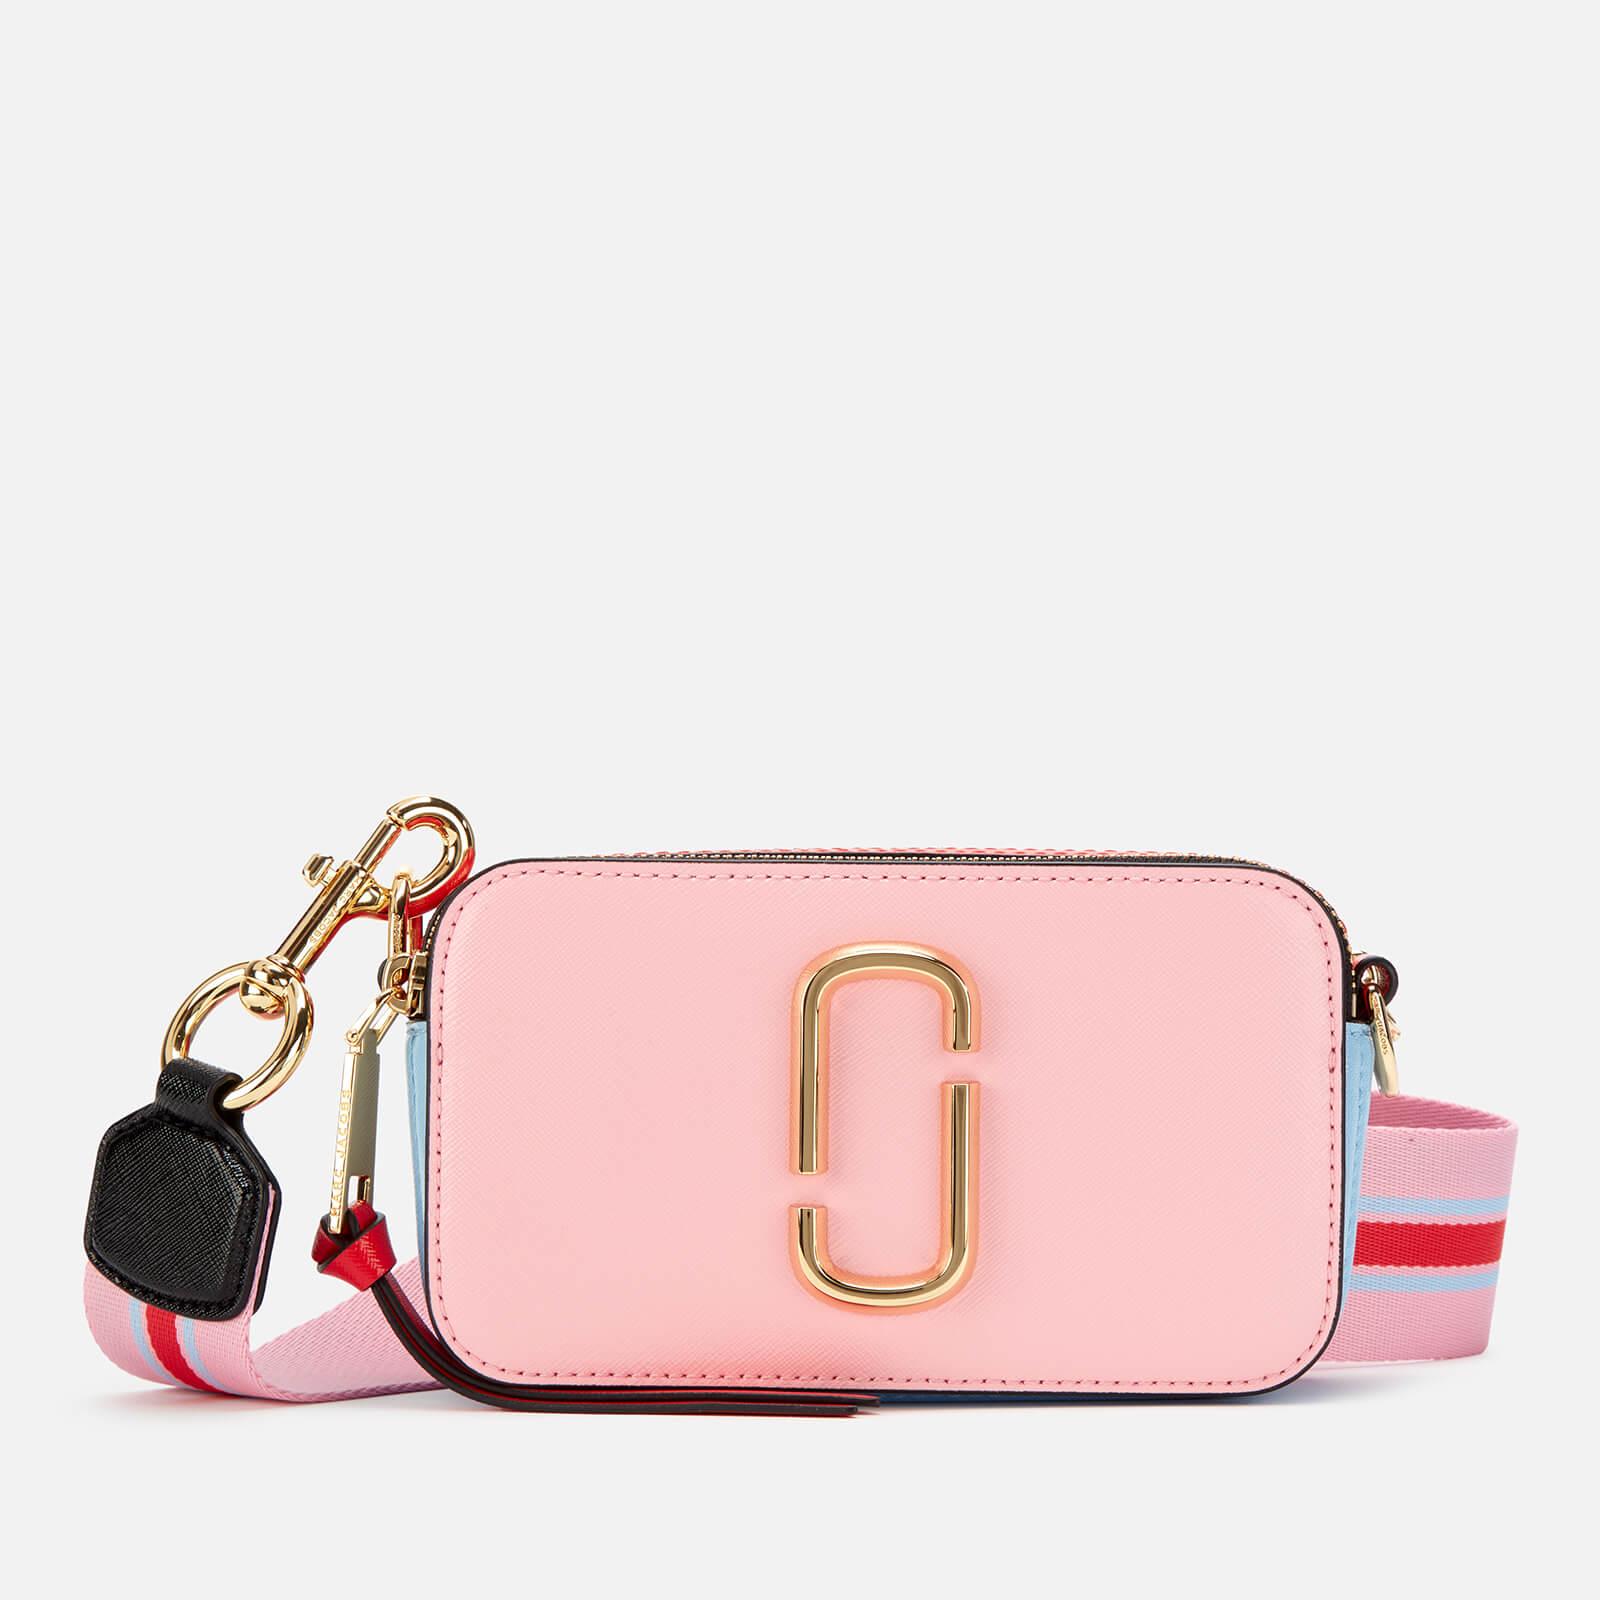 Marc Jacobs Women's Snapshot Cross Body Bag - Tart Pink Multi